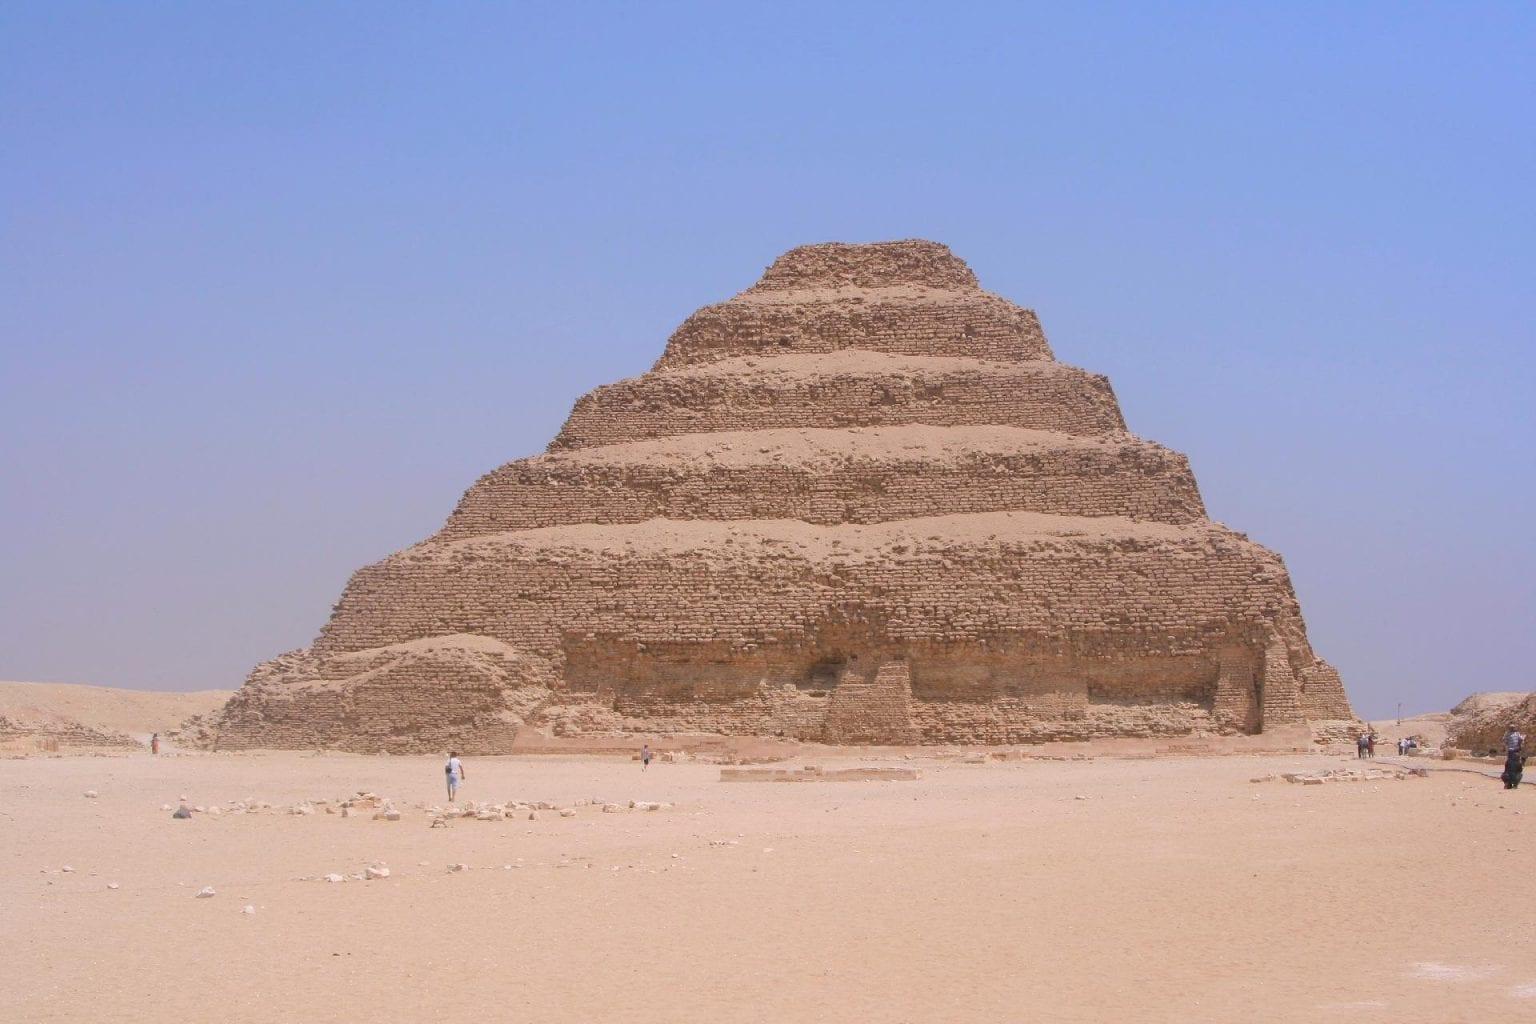 Step pyramid of Djoser. Credit: Jumpstory